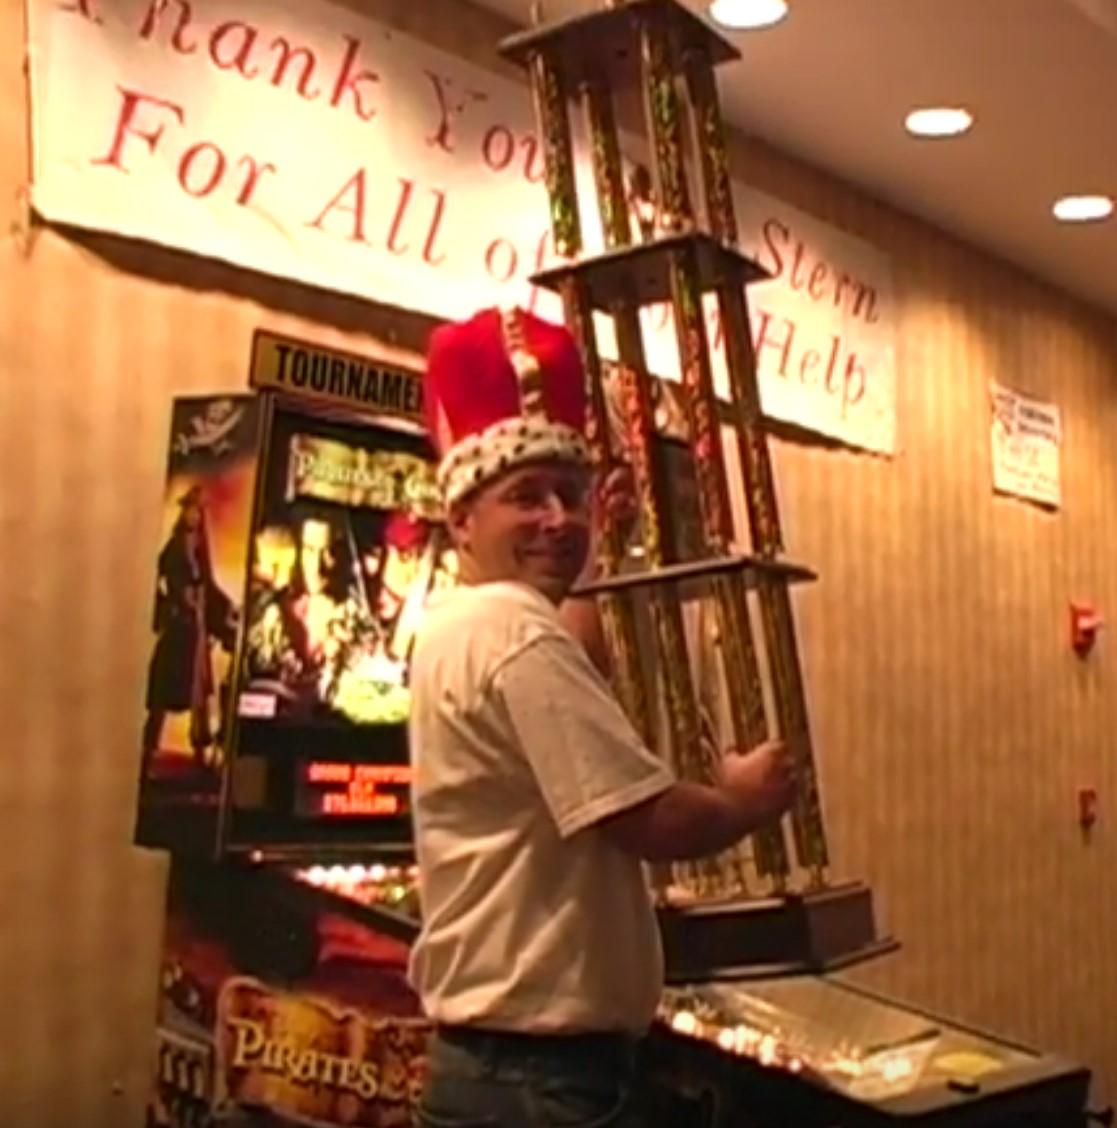 JPW Pinball Champ [Trailer Tom video]